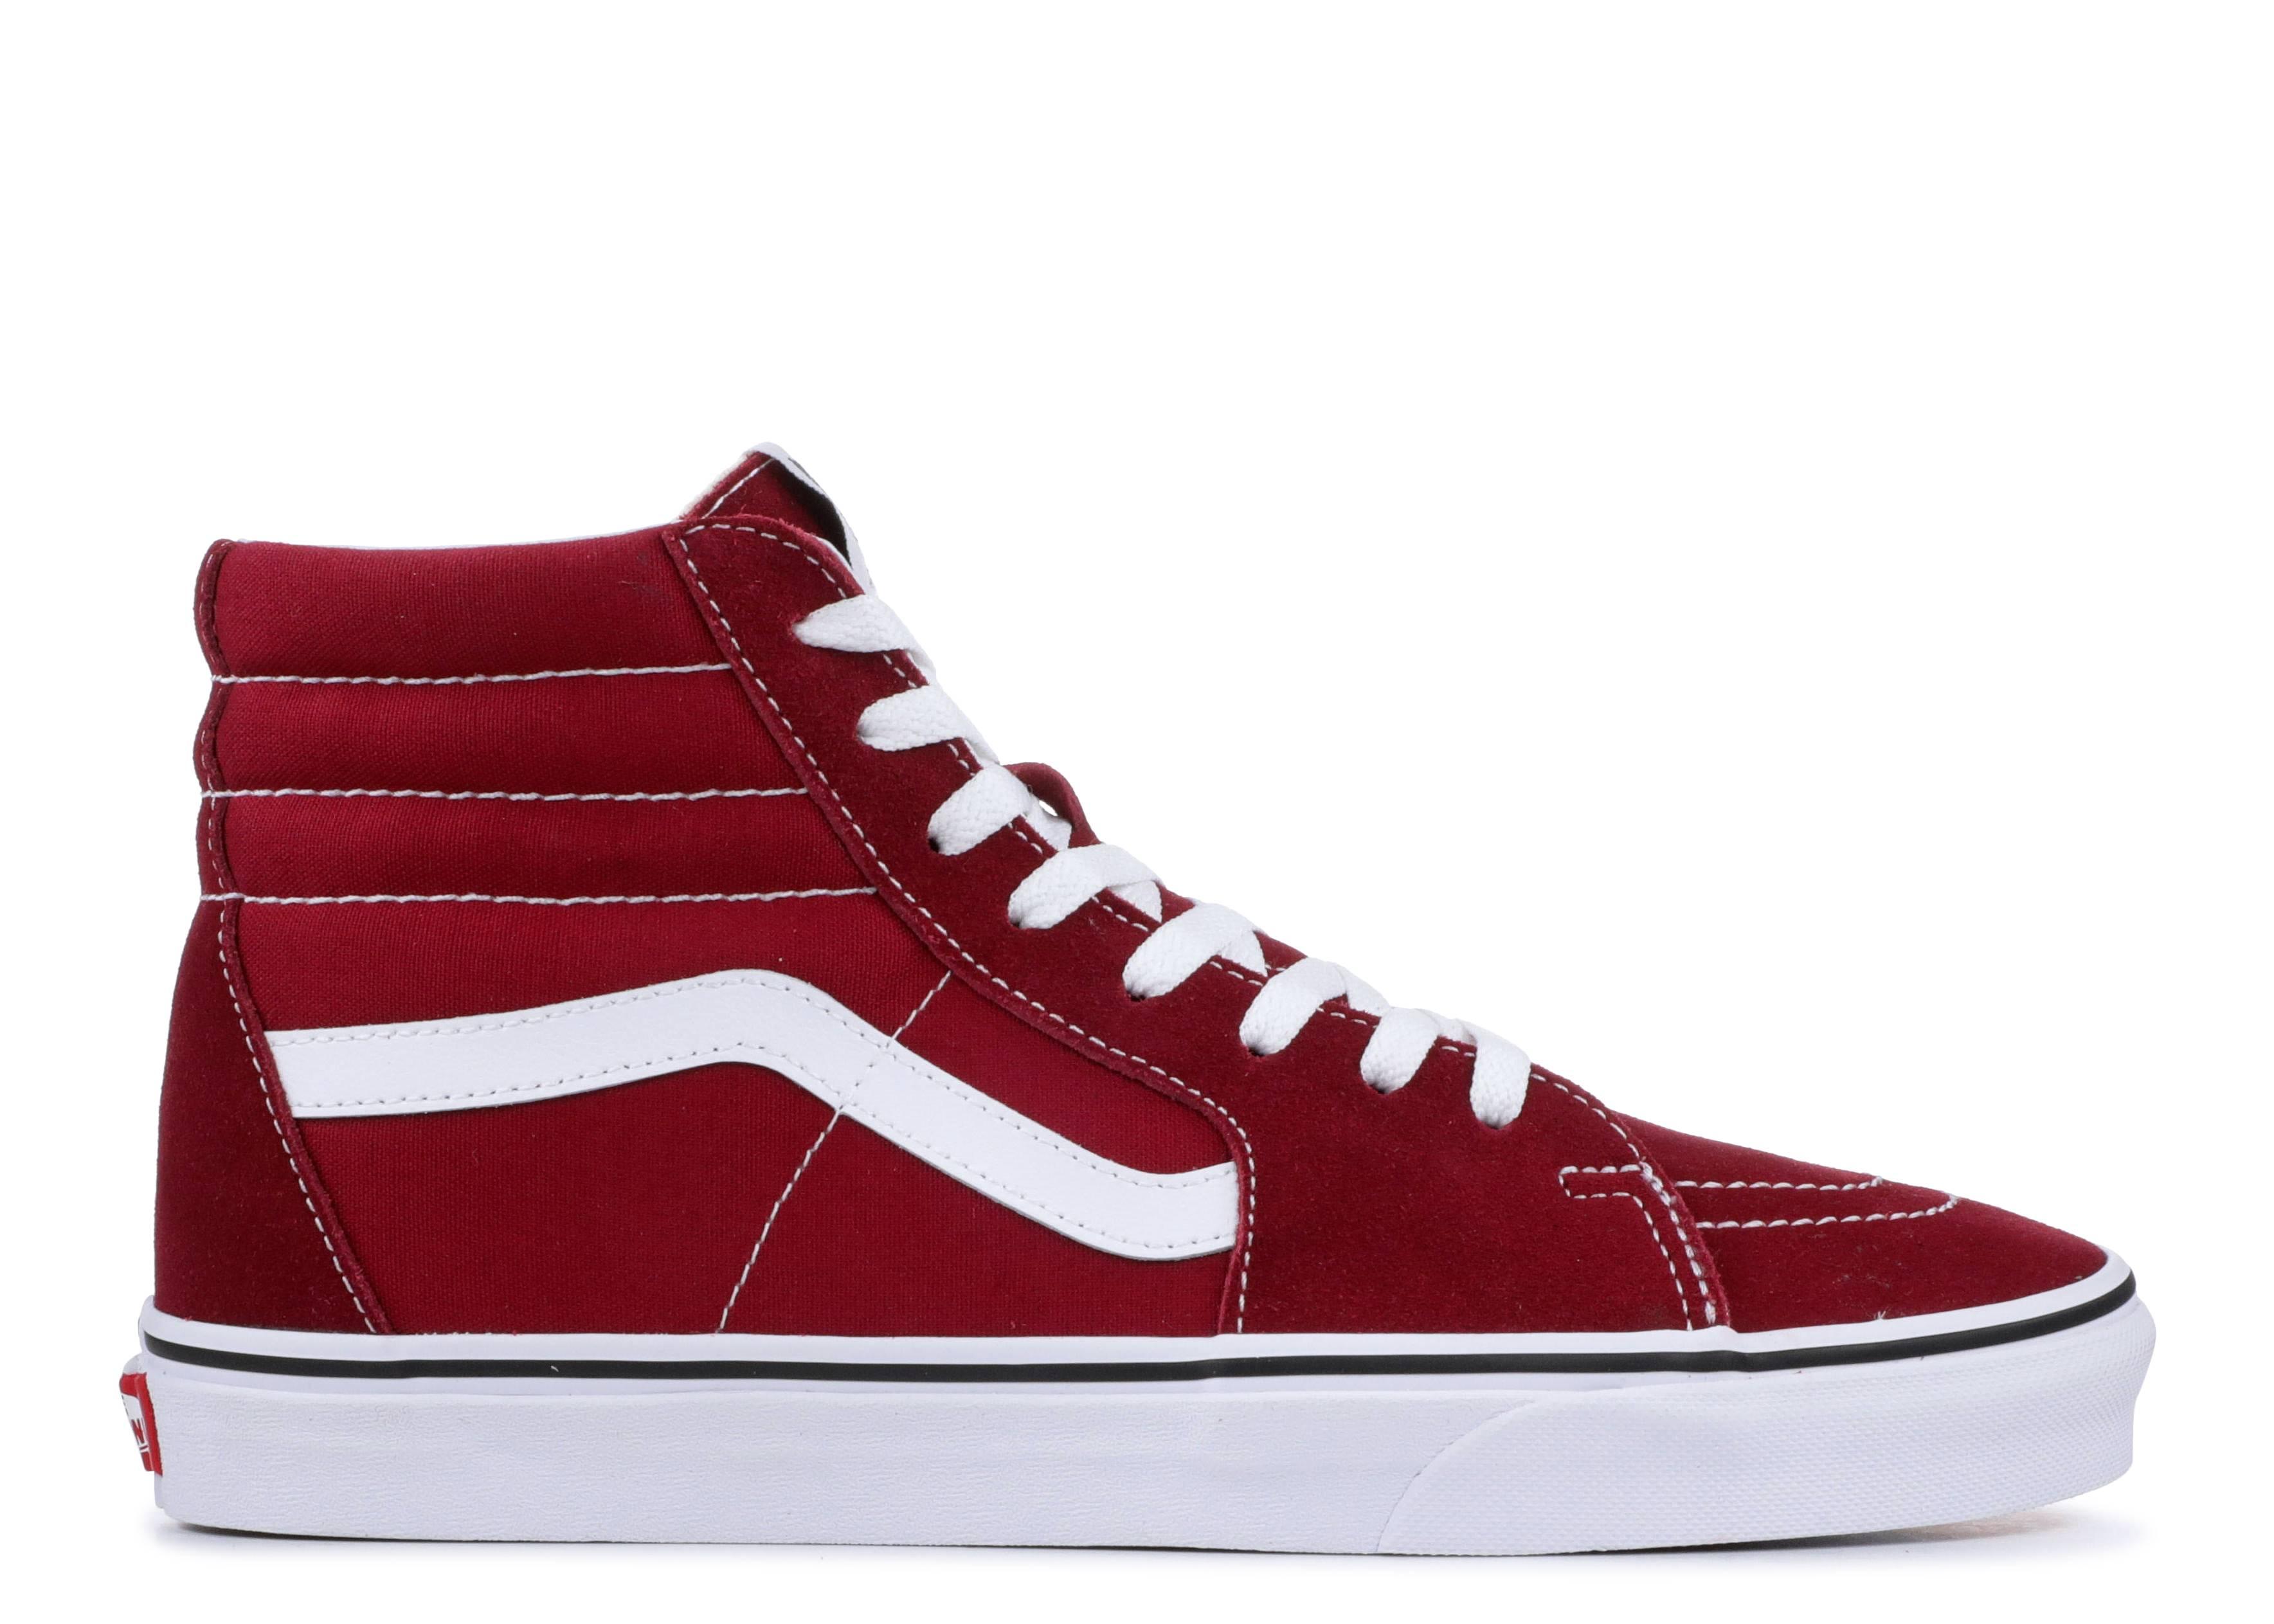 Vans Sneakers - High Tops 050b7f73a